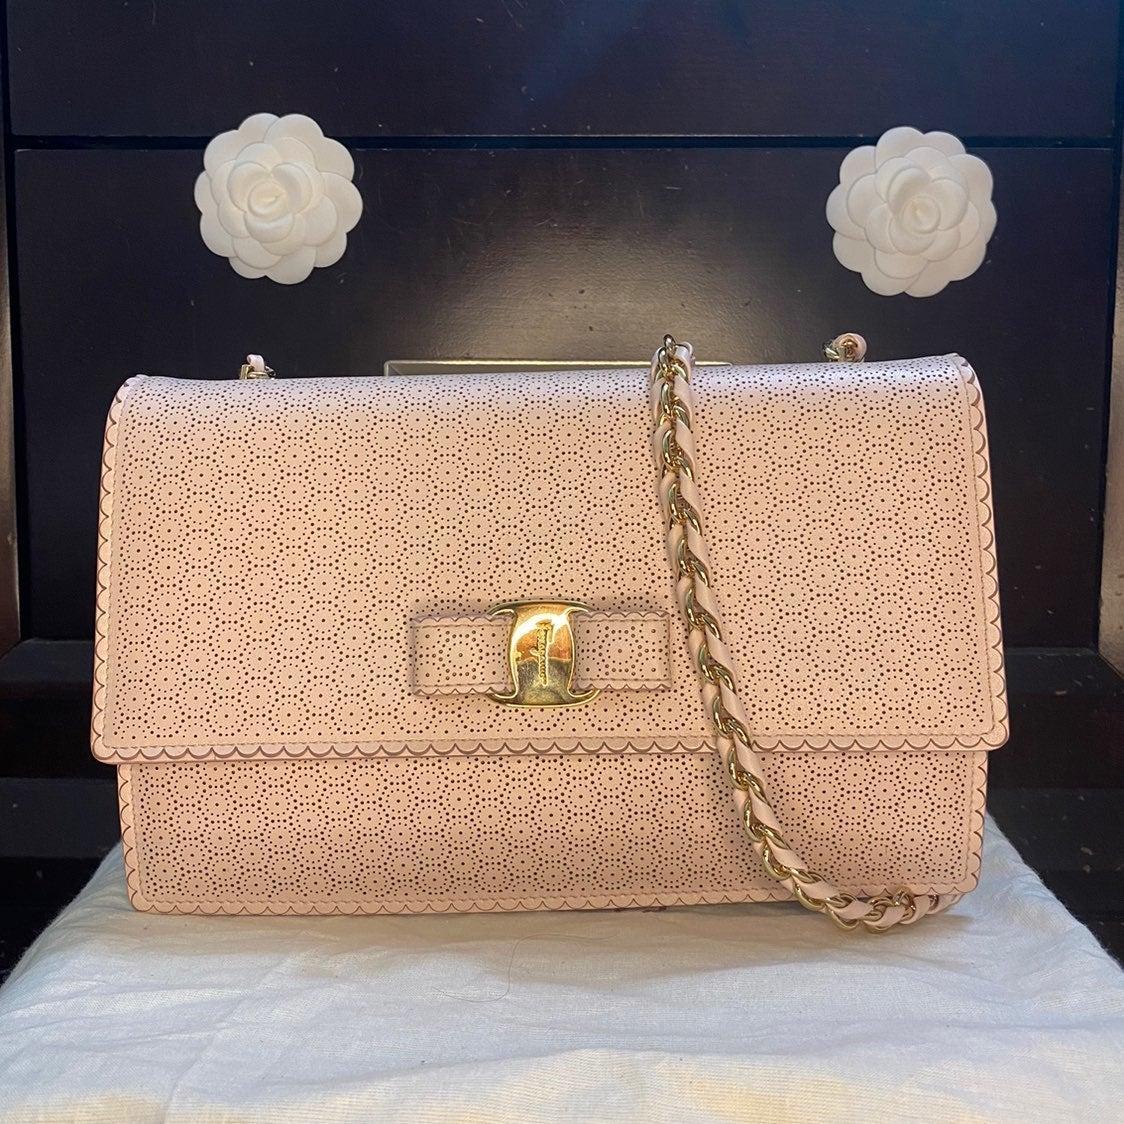 Salvatore Ferragamo Ginny Perforated Bag